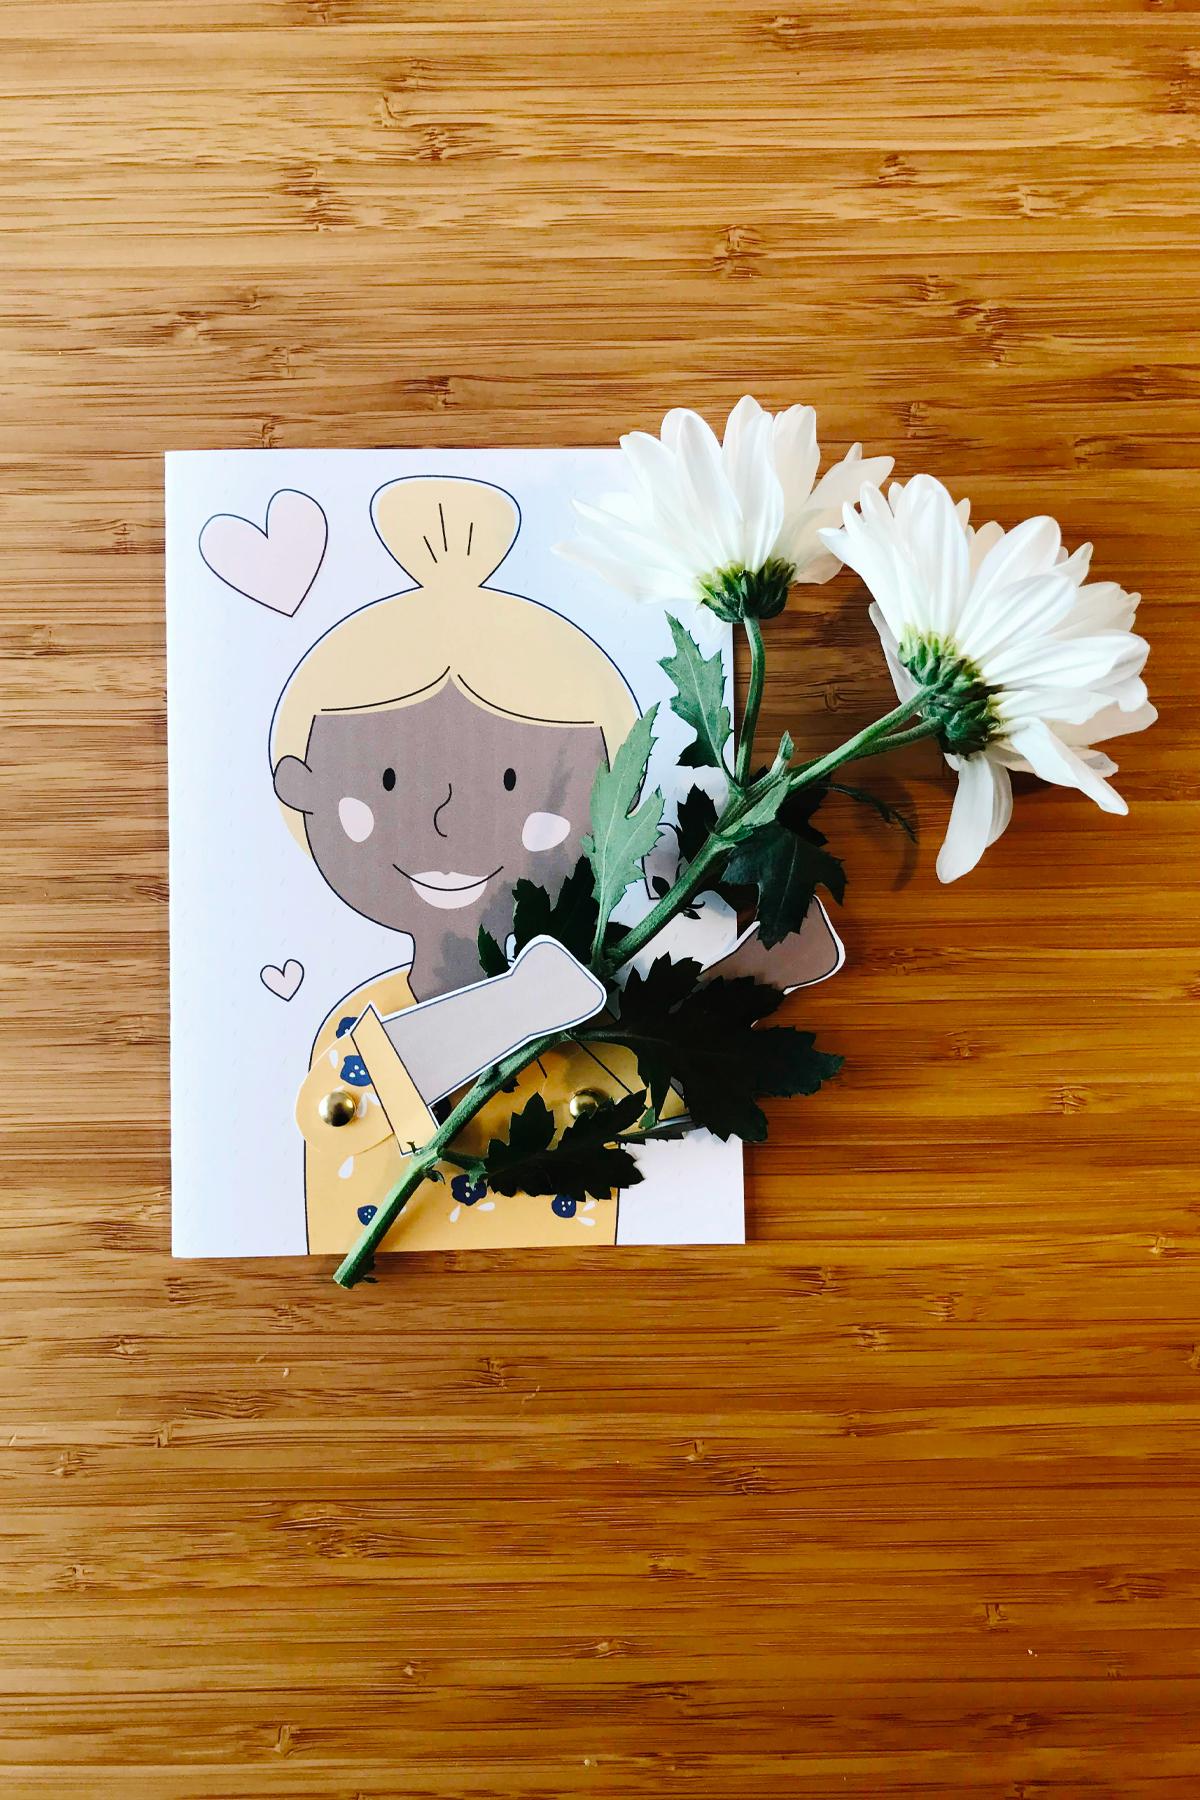 32_mini_me_mothers_day_card_printable_post.jpg